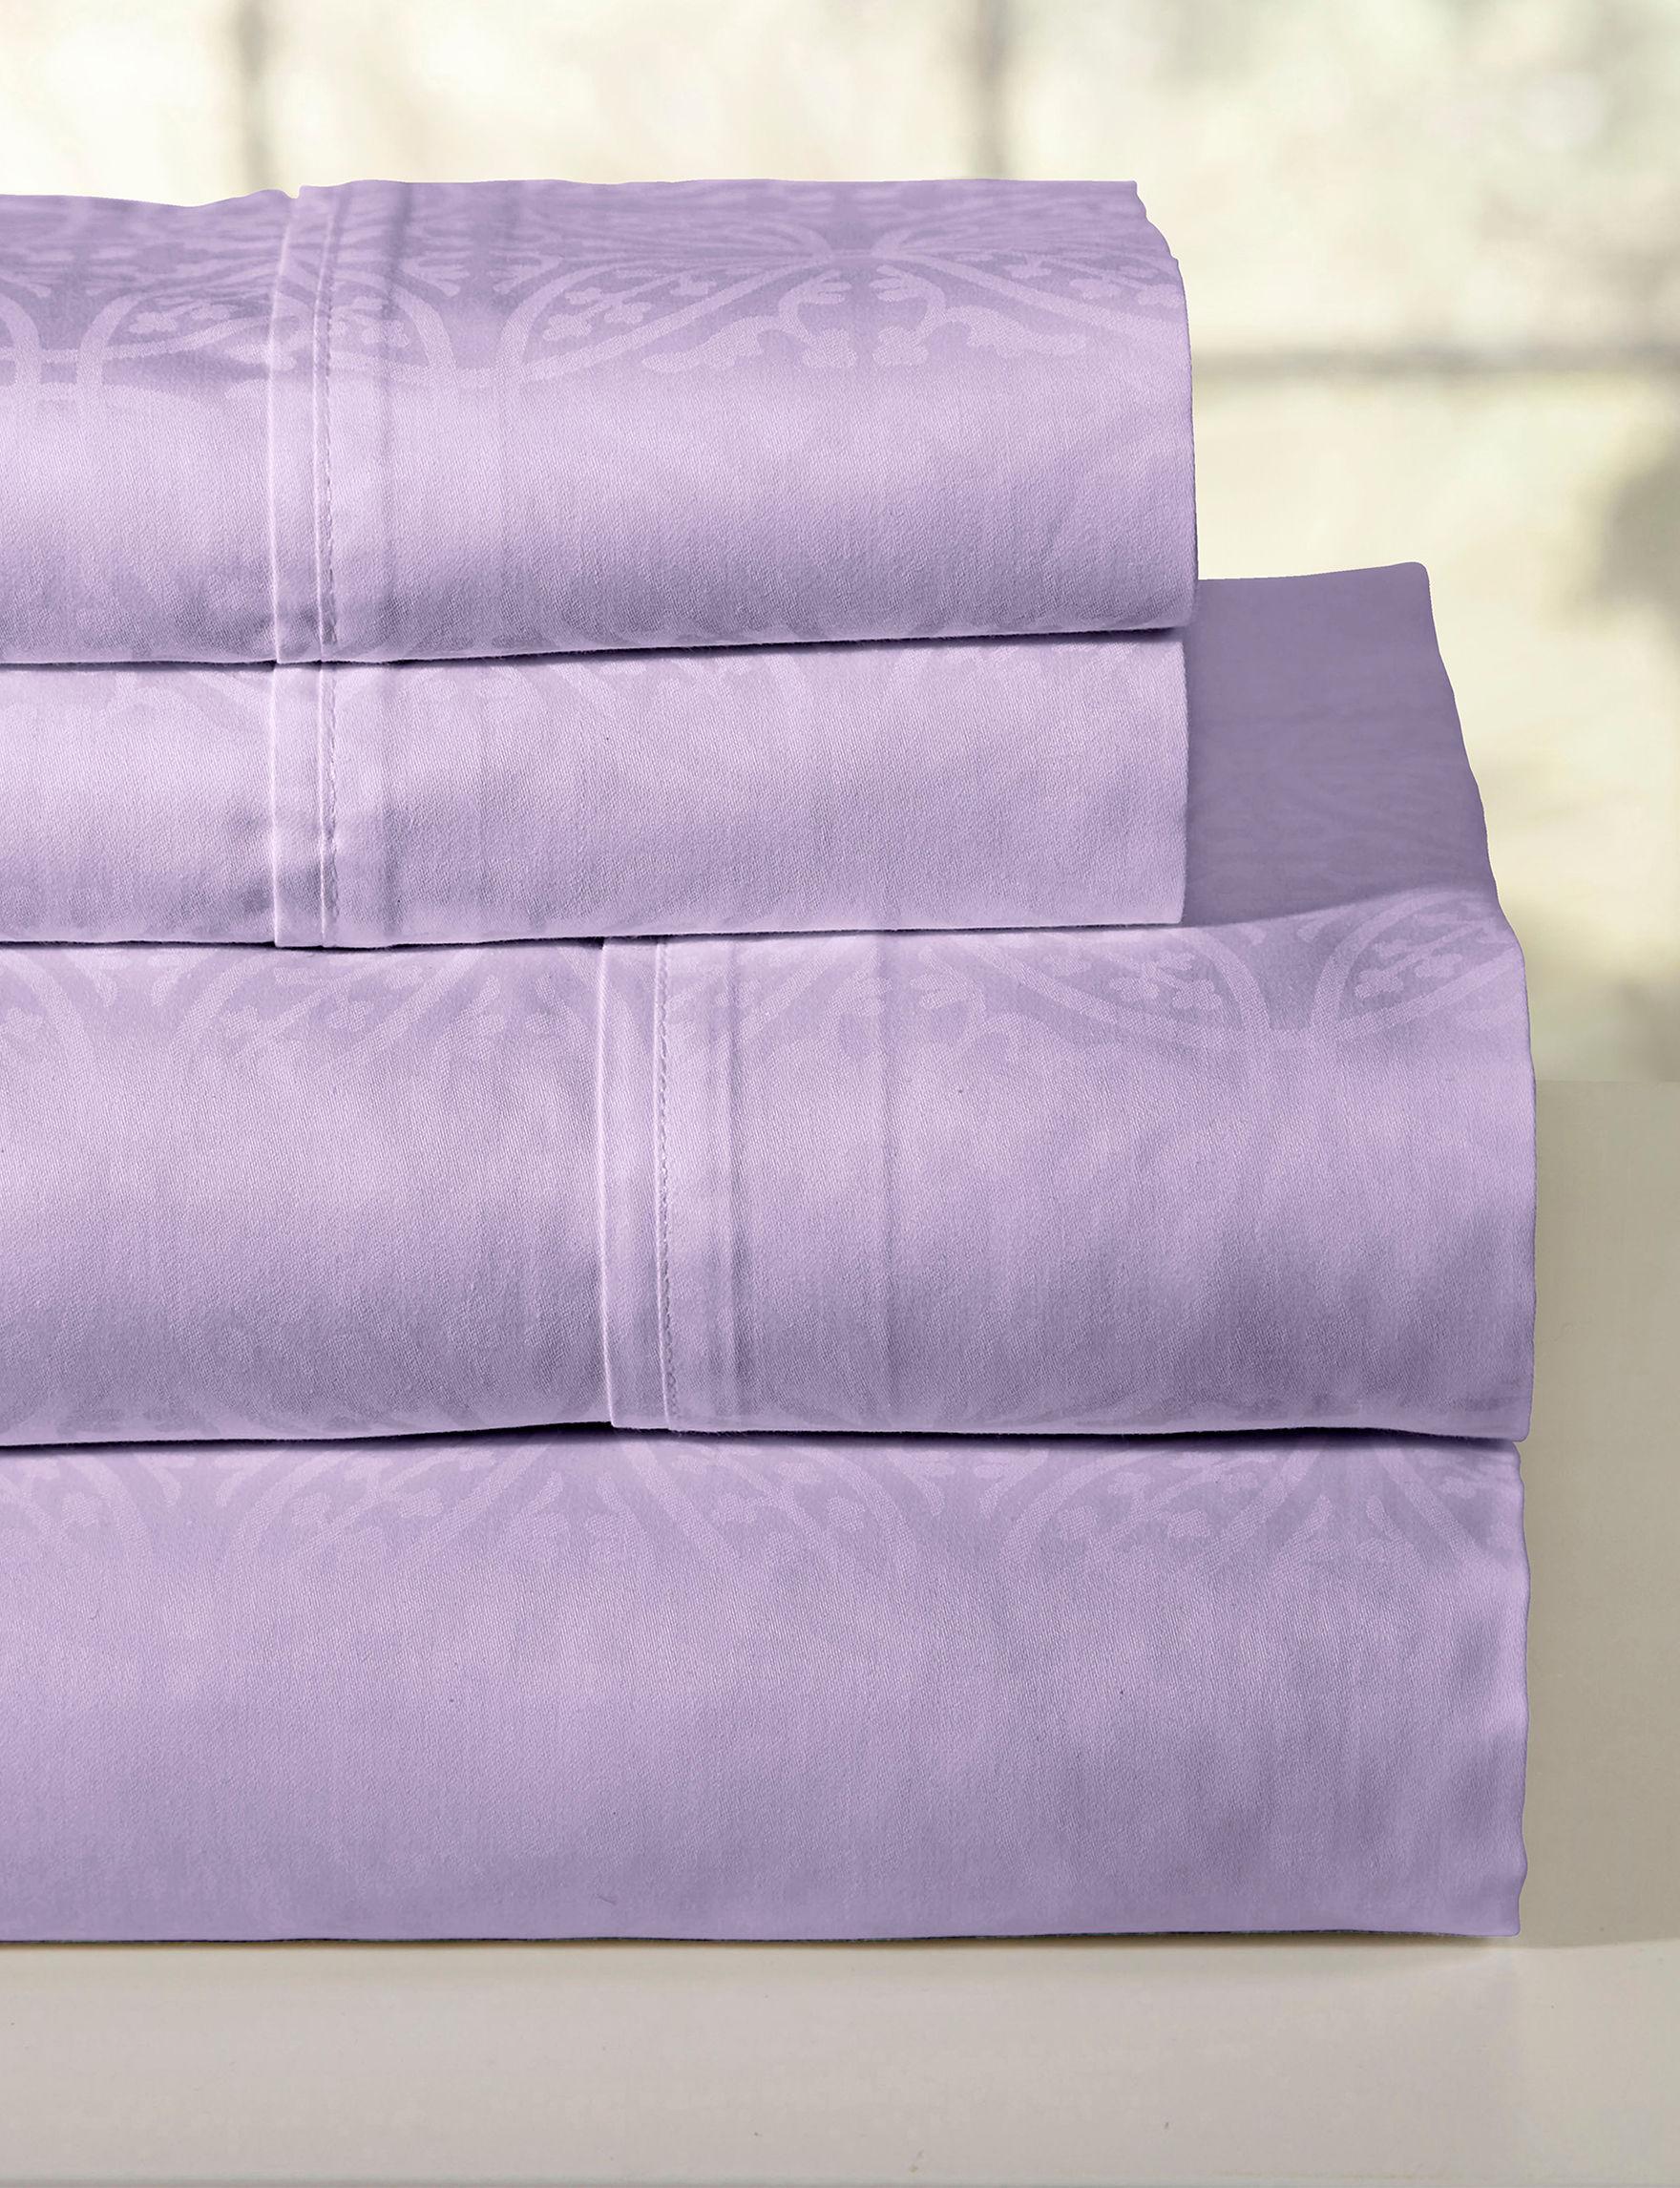 Pointehaven Lavender Sheets & Pillowcases